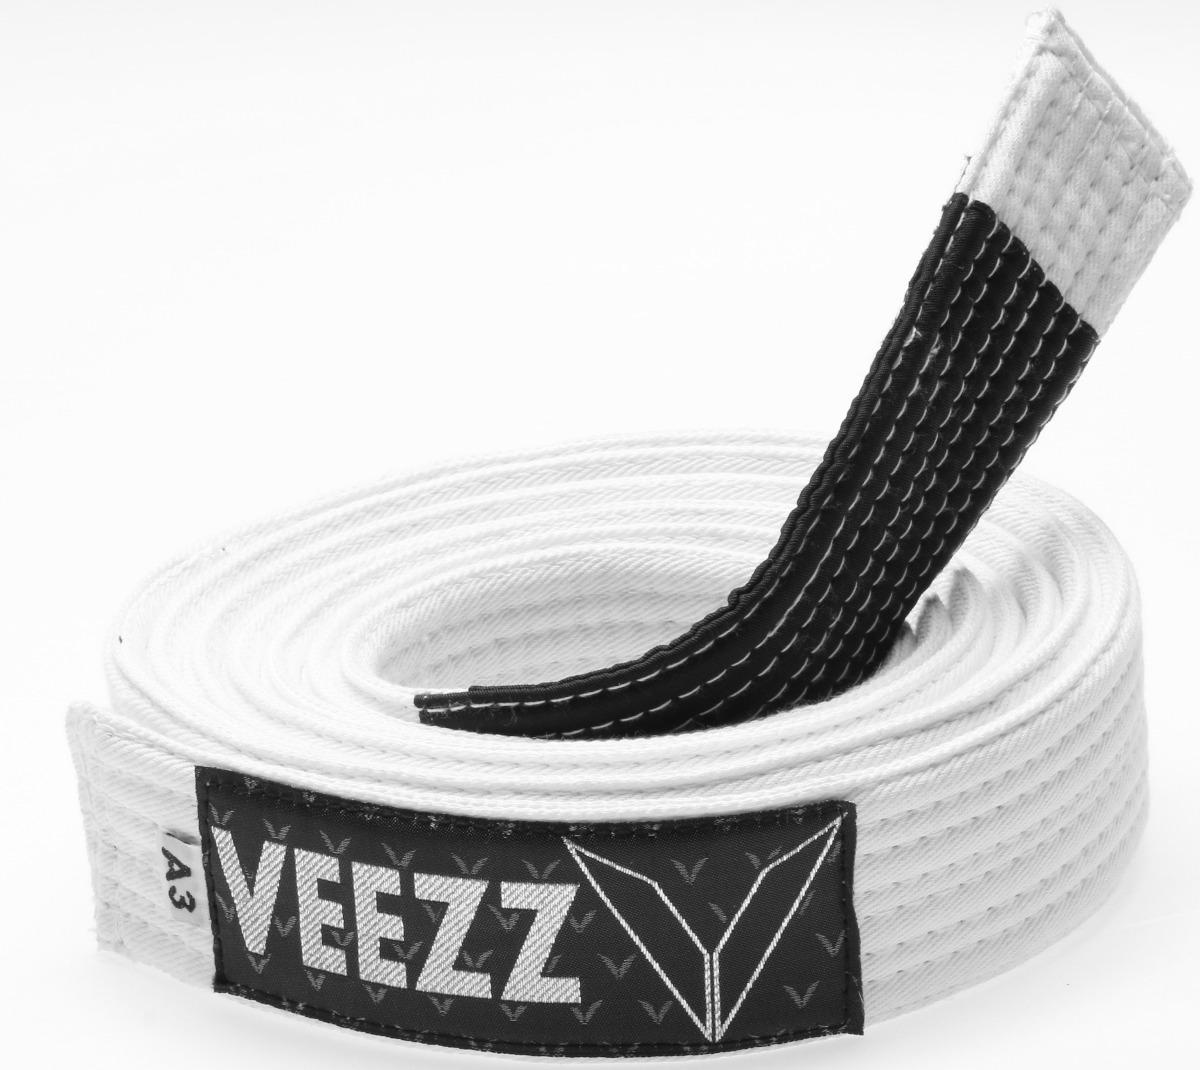 3c3fa931d faixa branca jiu jitsu grossa 8 costuras ponta preta- veezz. Carregando zoom .